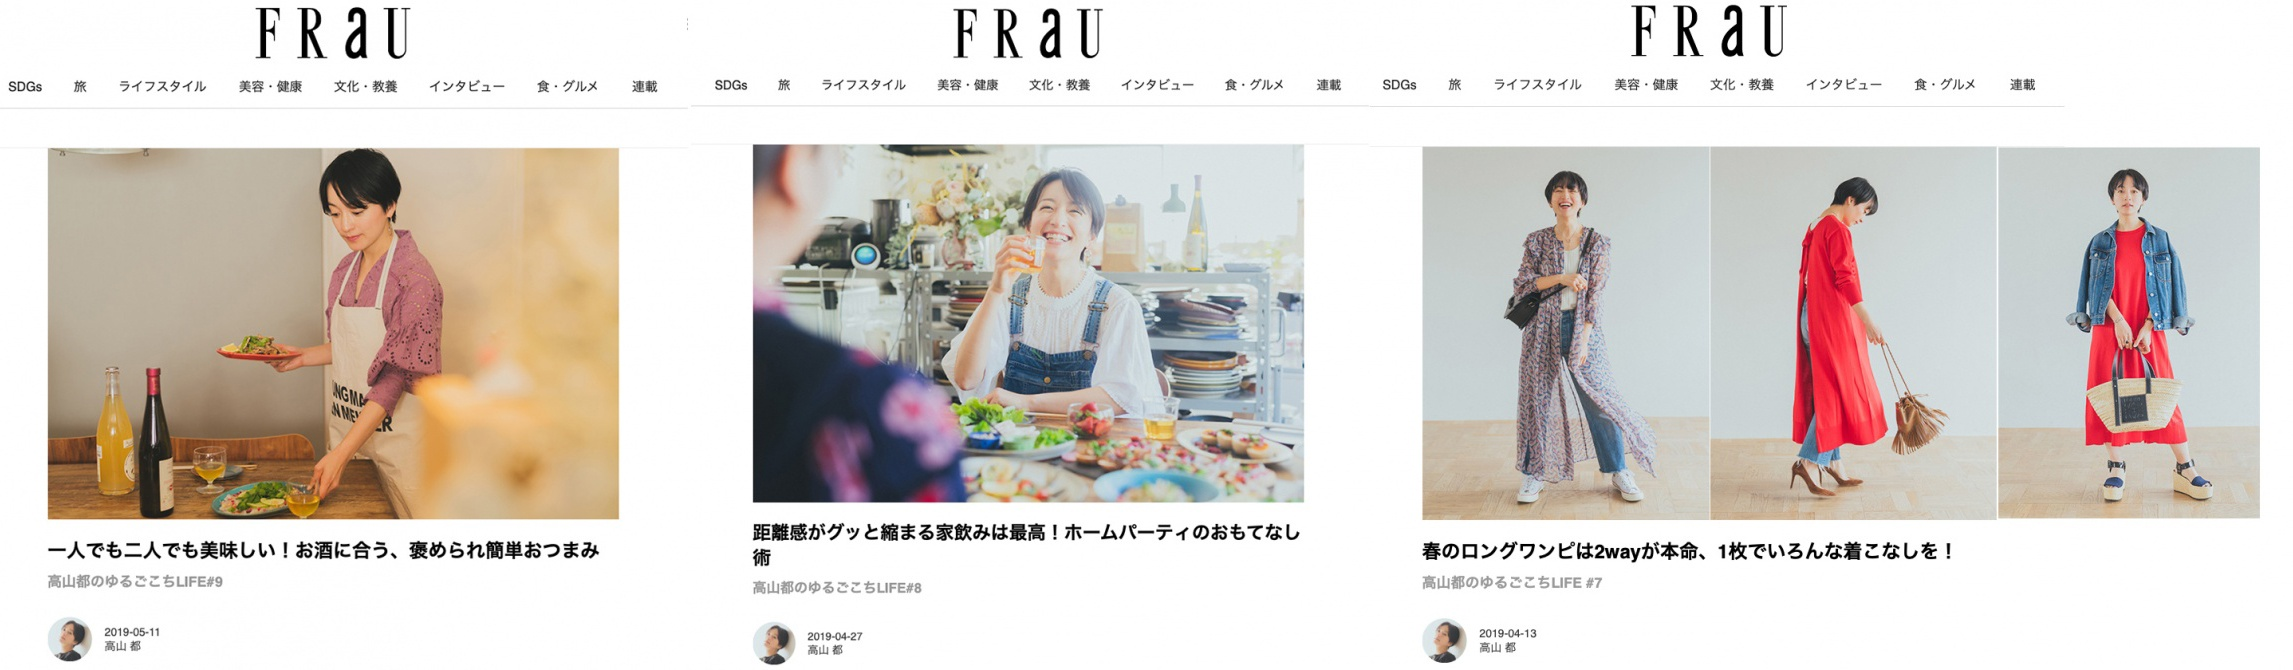 FRaU_online_2019